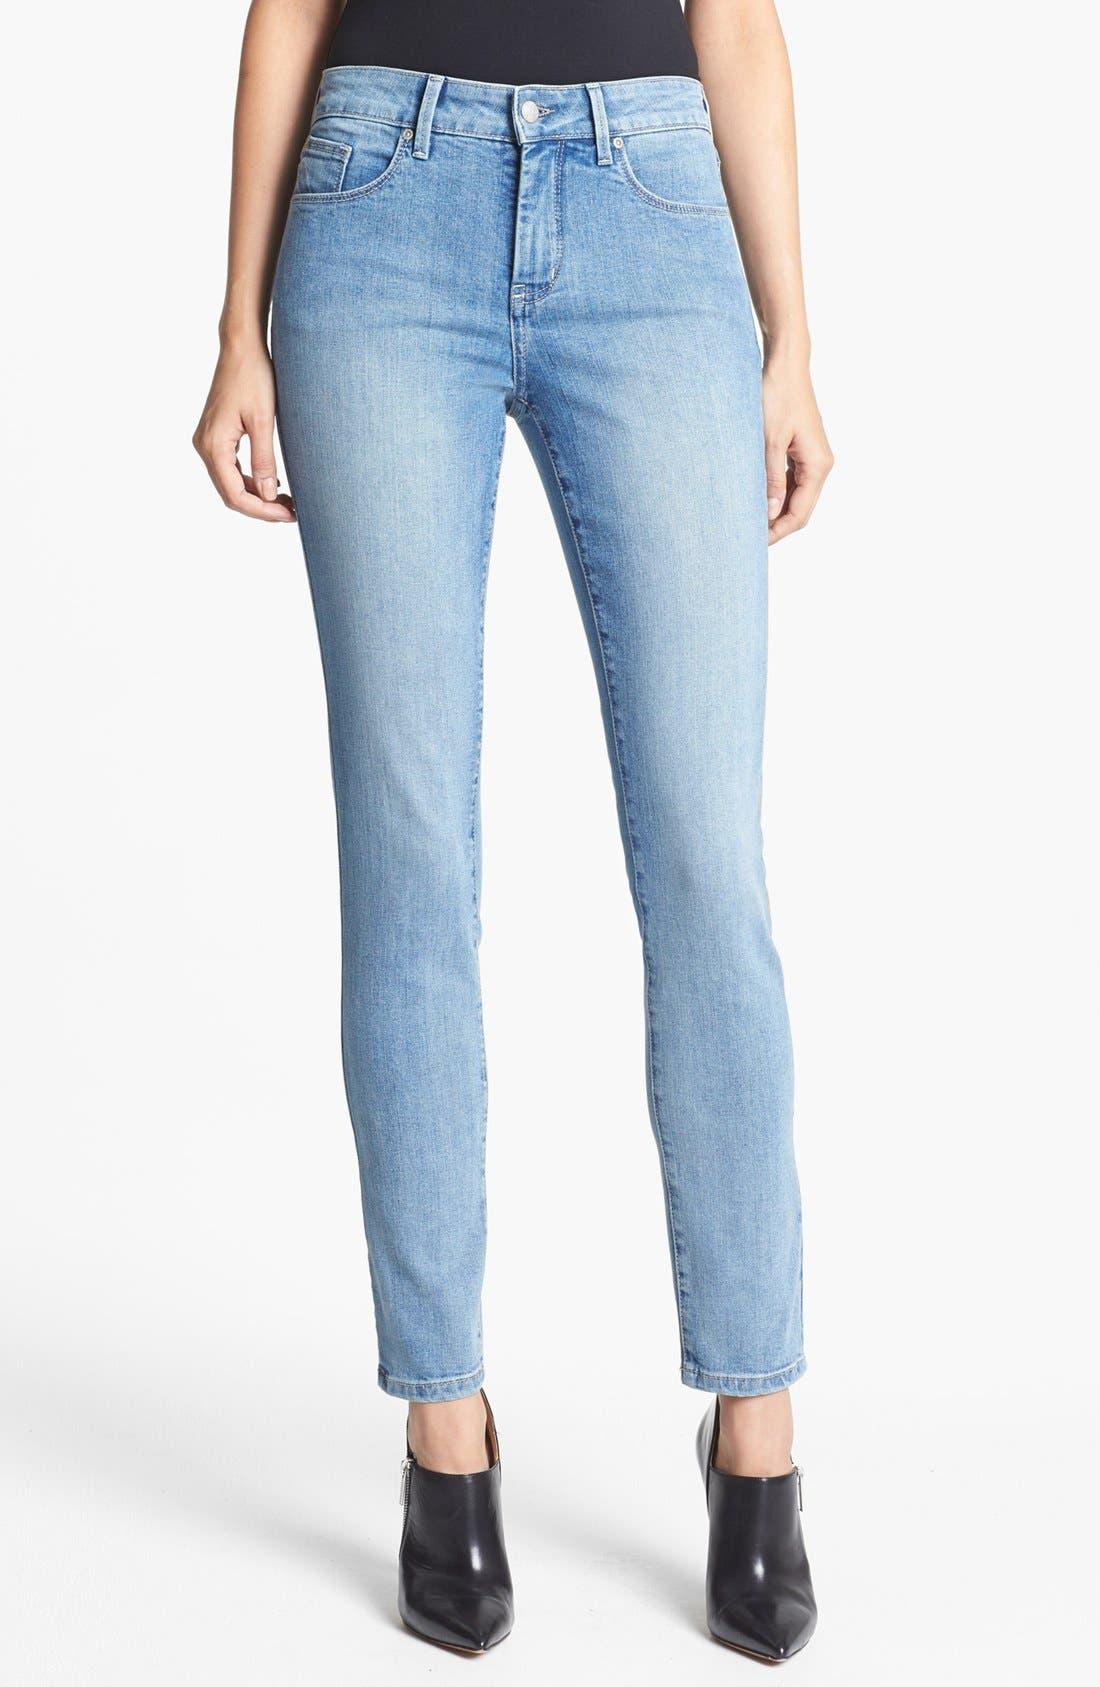 Main Image - NYDJ 'Alina' Stretch Skinny Jeans (Sacramento) (Petite)